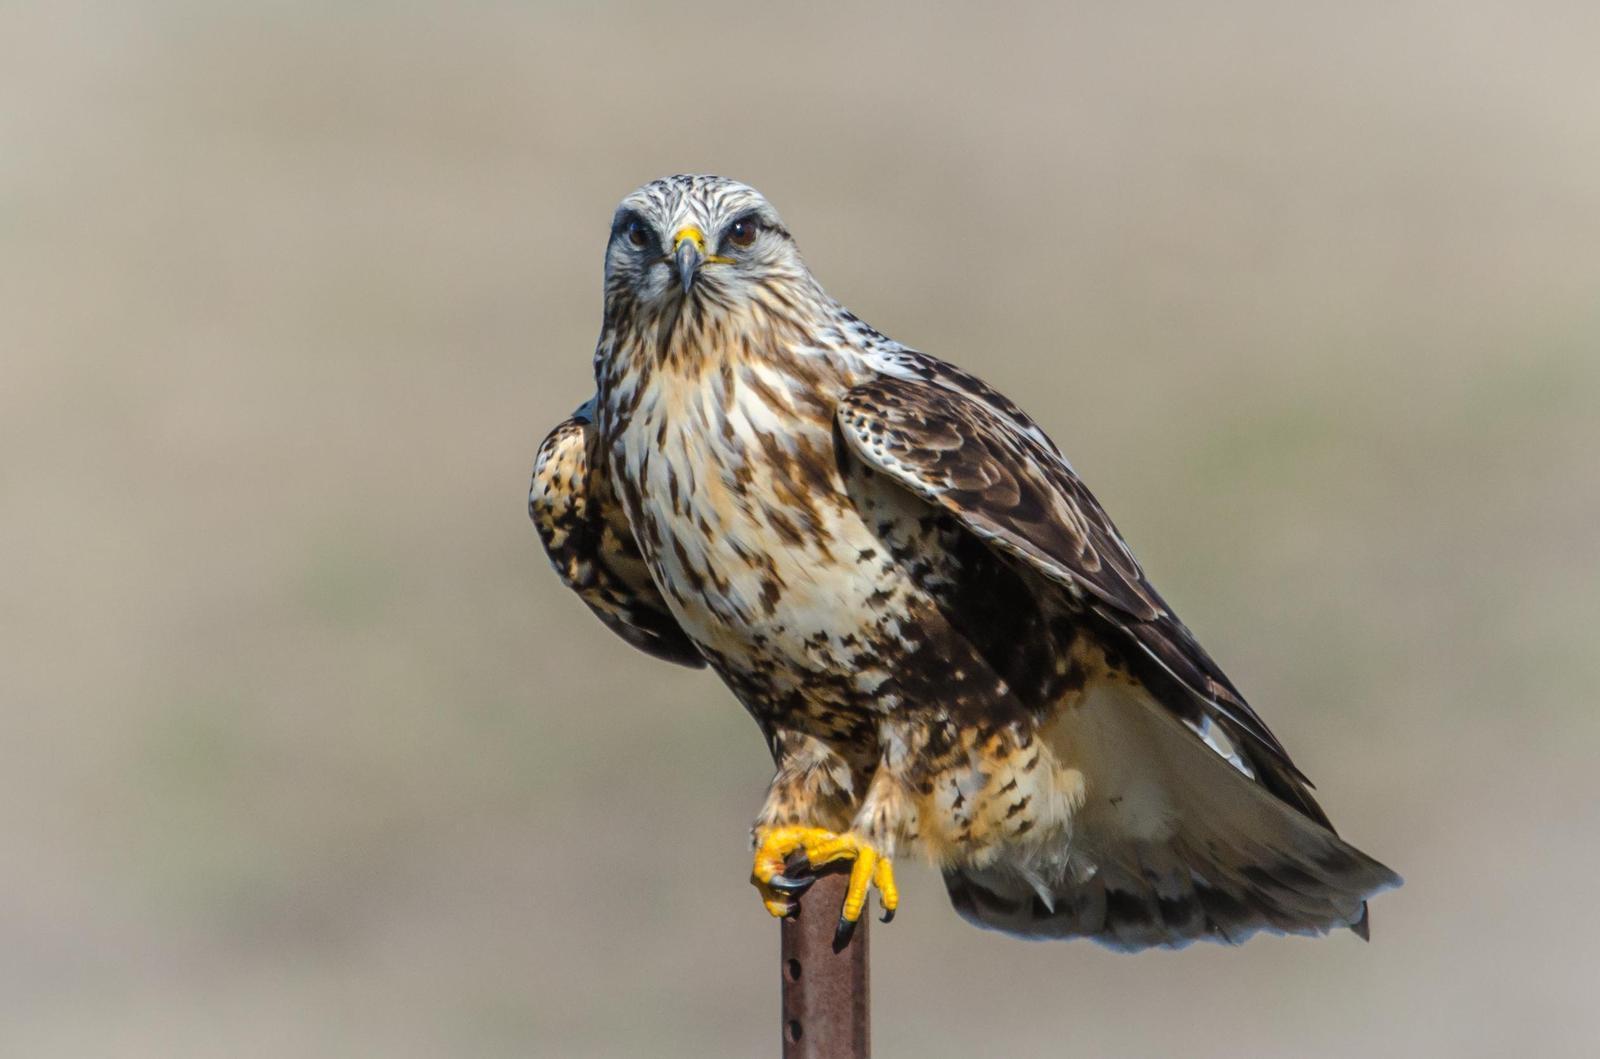 Rough-legged Hawk Photo by Scott Yerges